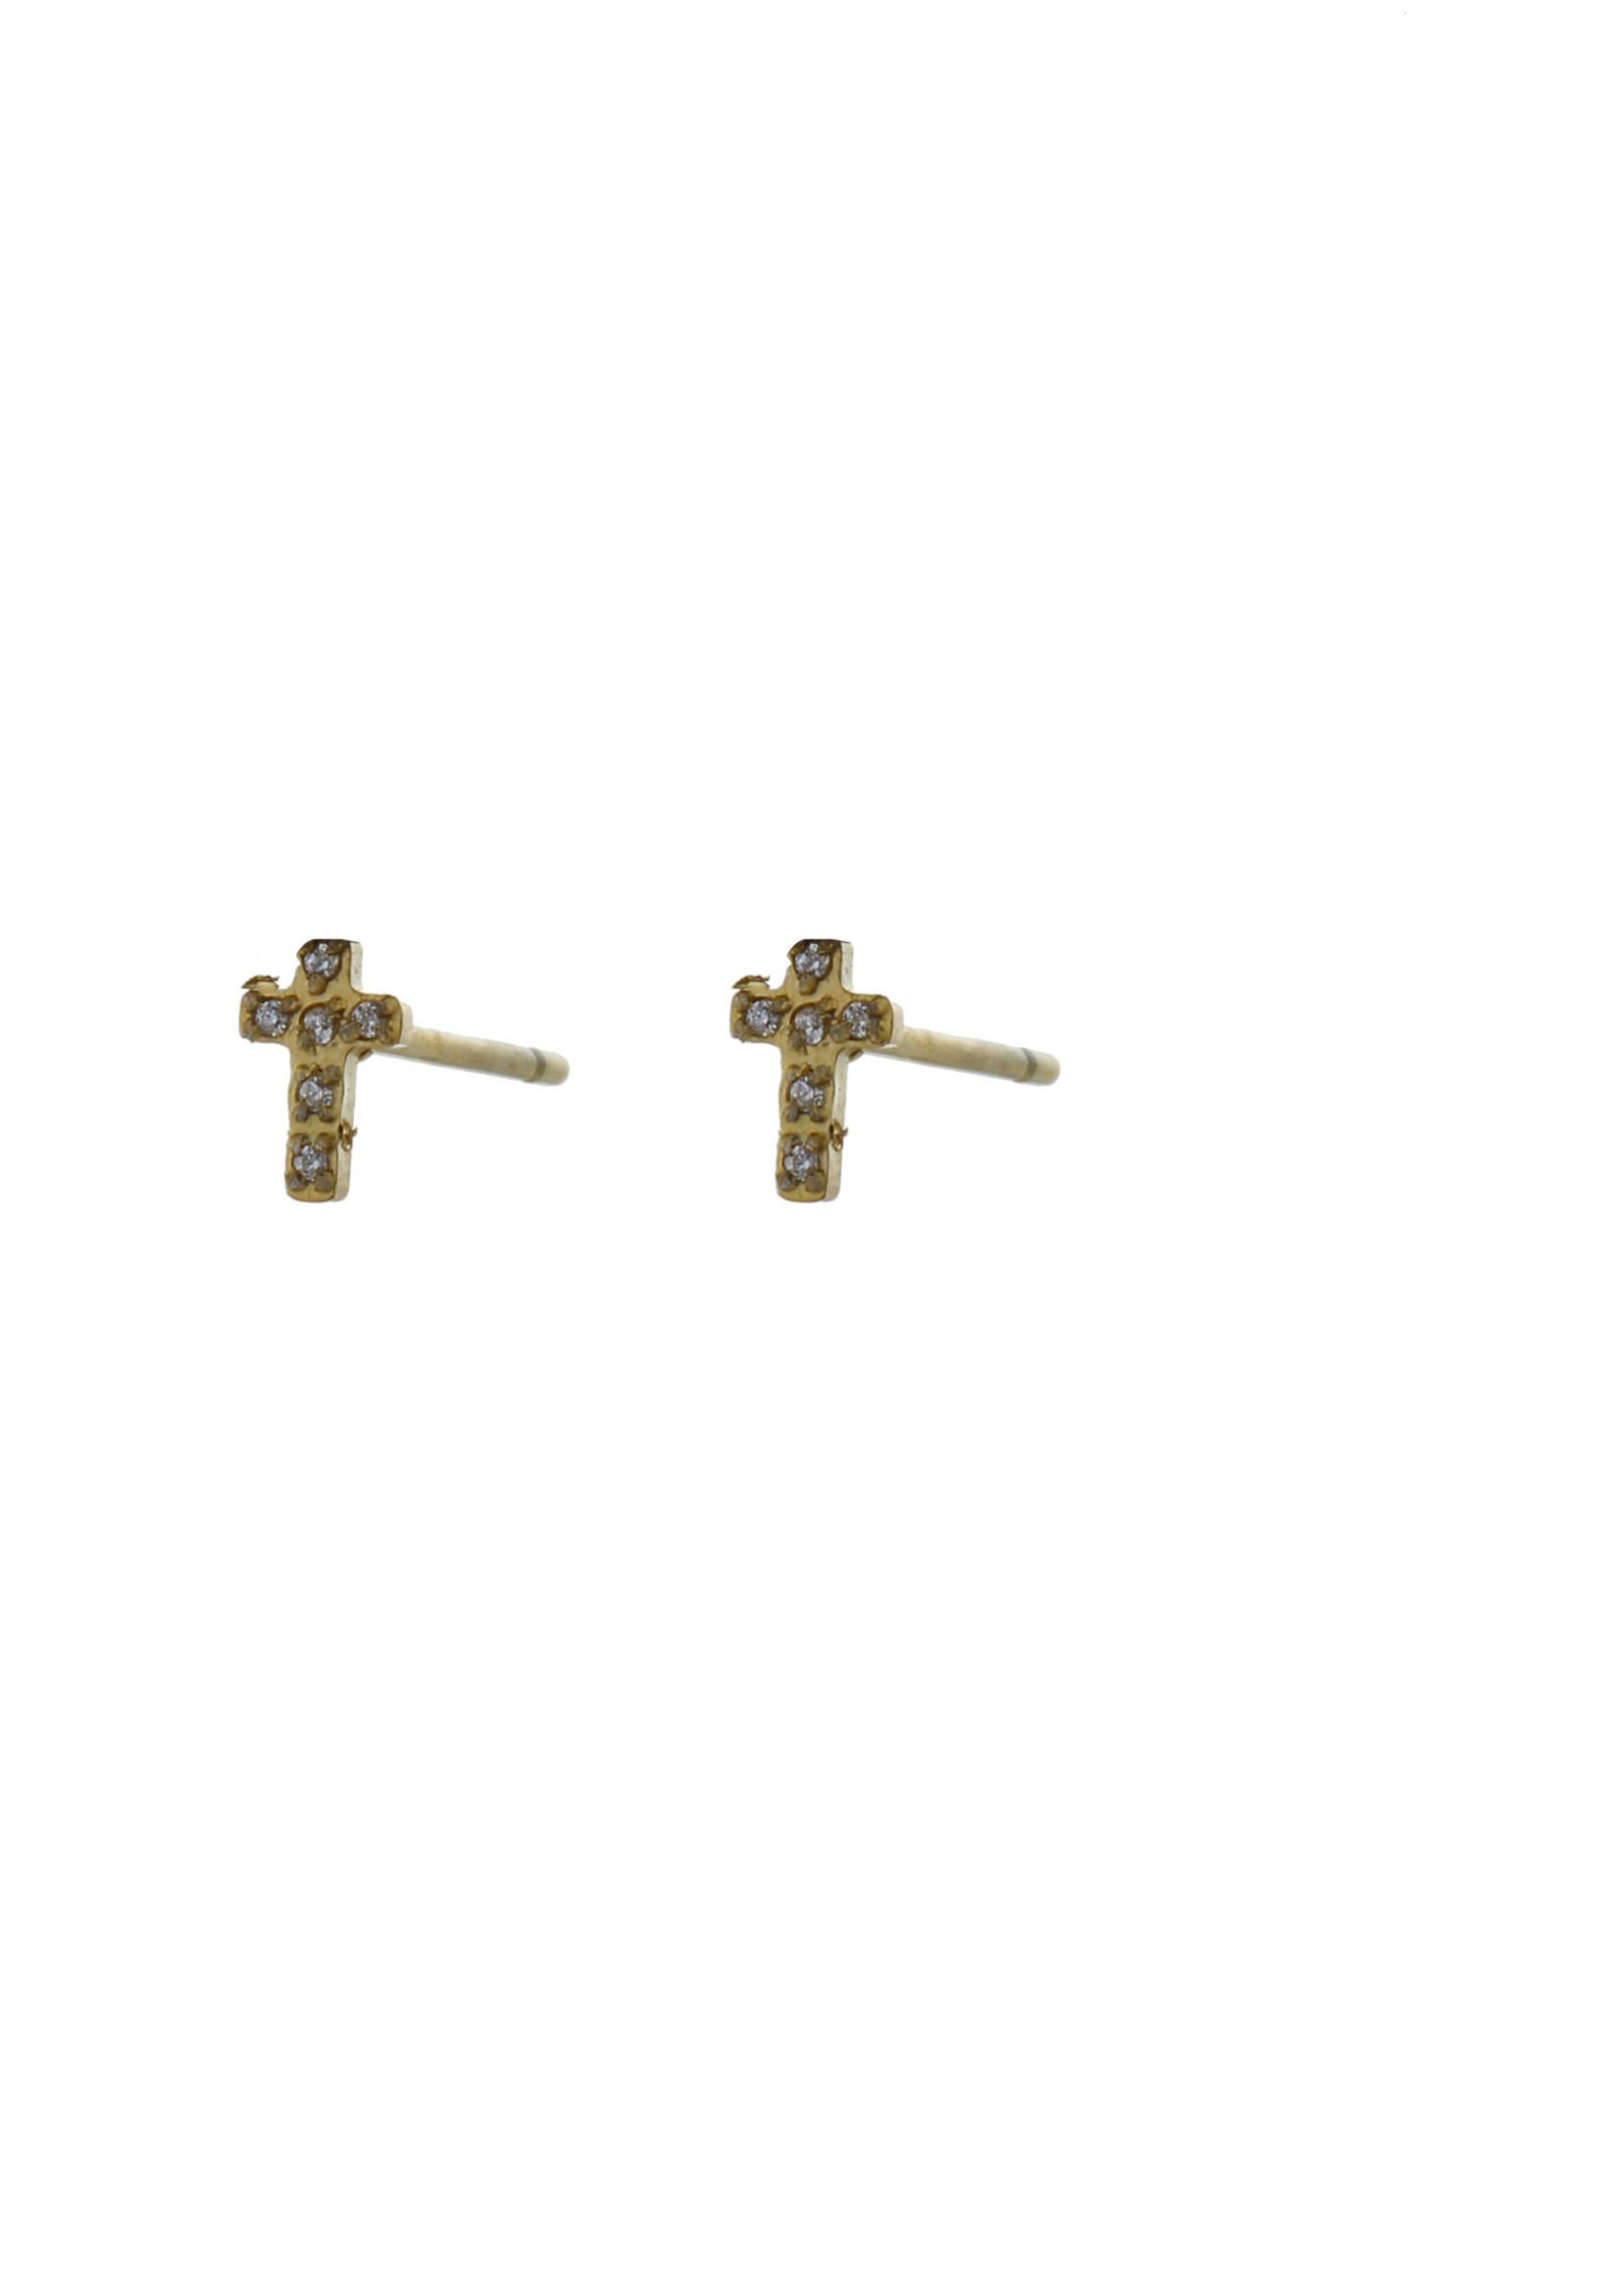 Oorbel goud kruisje met steentjes E0779-2